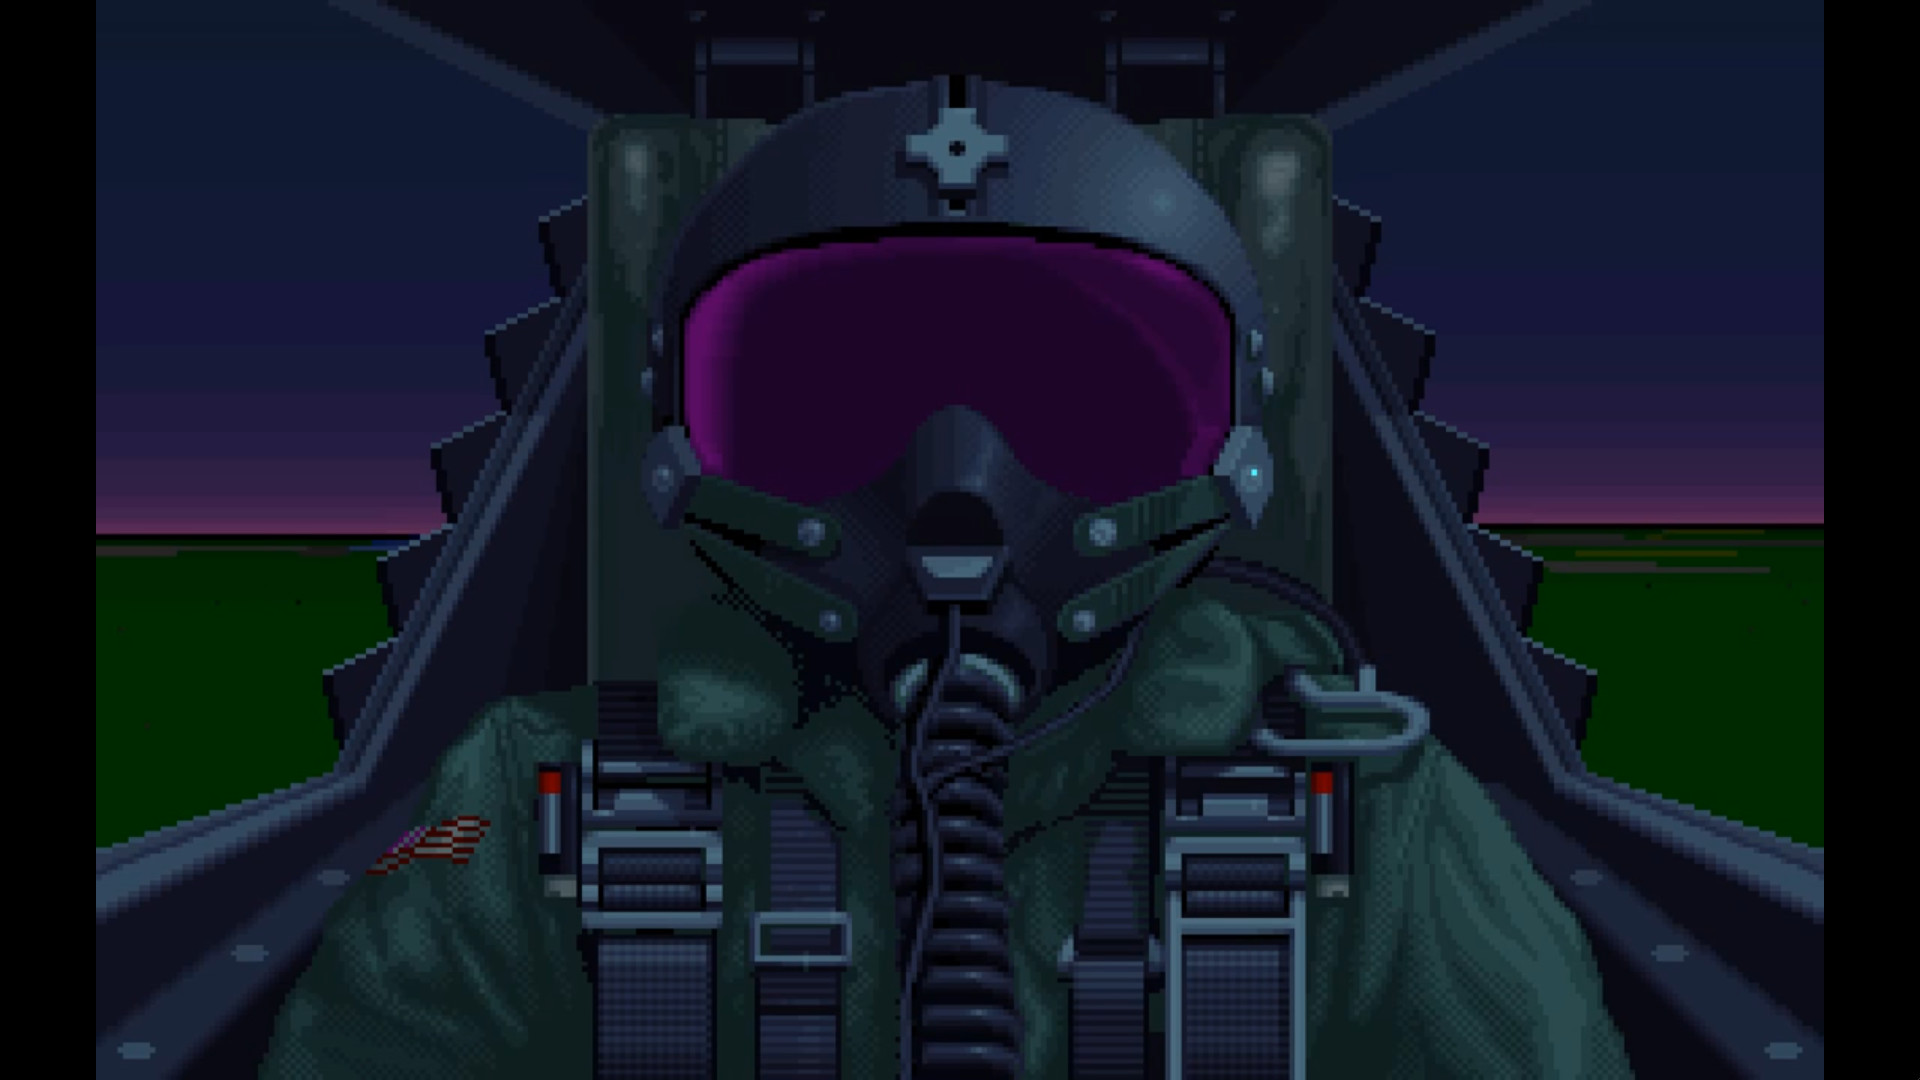 F-117A Nighthawk Stealth Fighter 2.0 screenshot 1